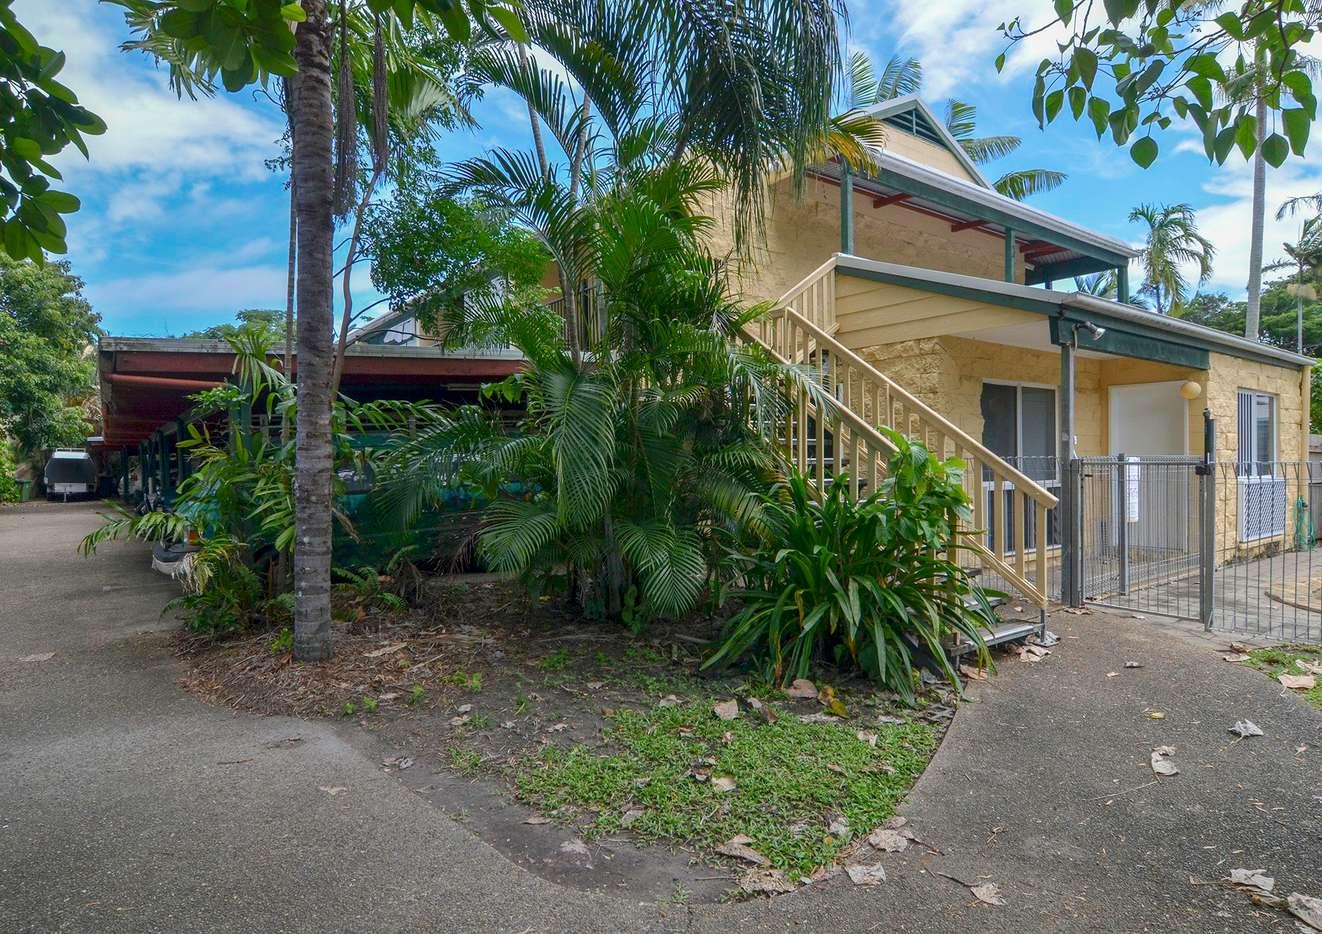 Main view of Homely studio listing, 14 Triton Lodge/4 Triton Crescent, Port Douglas, QLD 4877